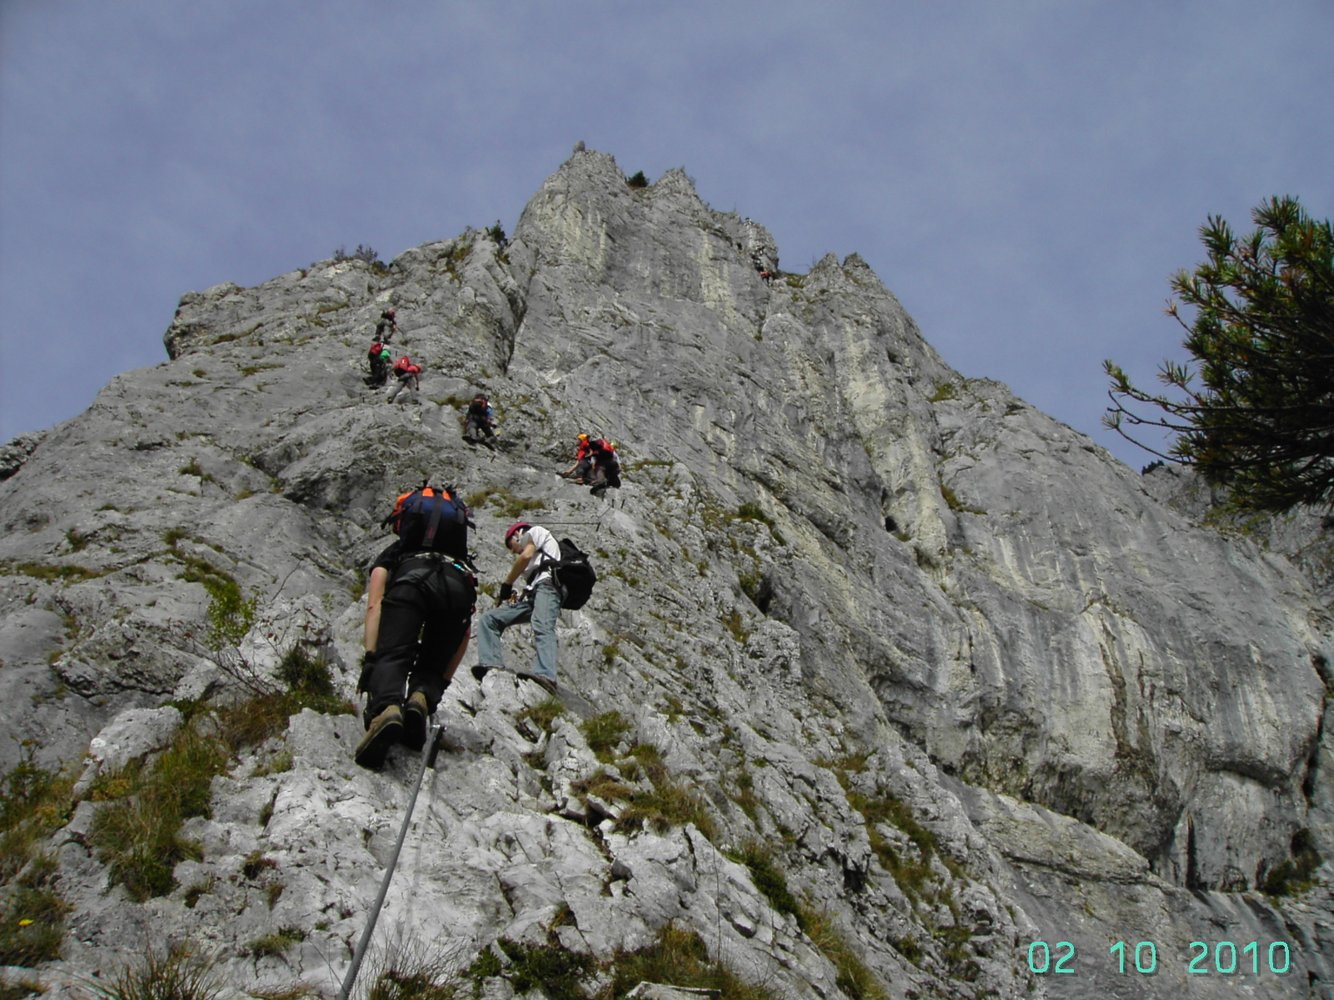 Franz Josef Klettersteig : Kaiser franz joseph klettersteig seemauer bergsteigen